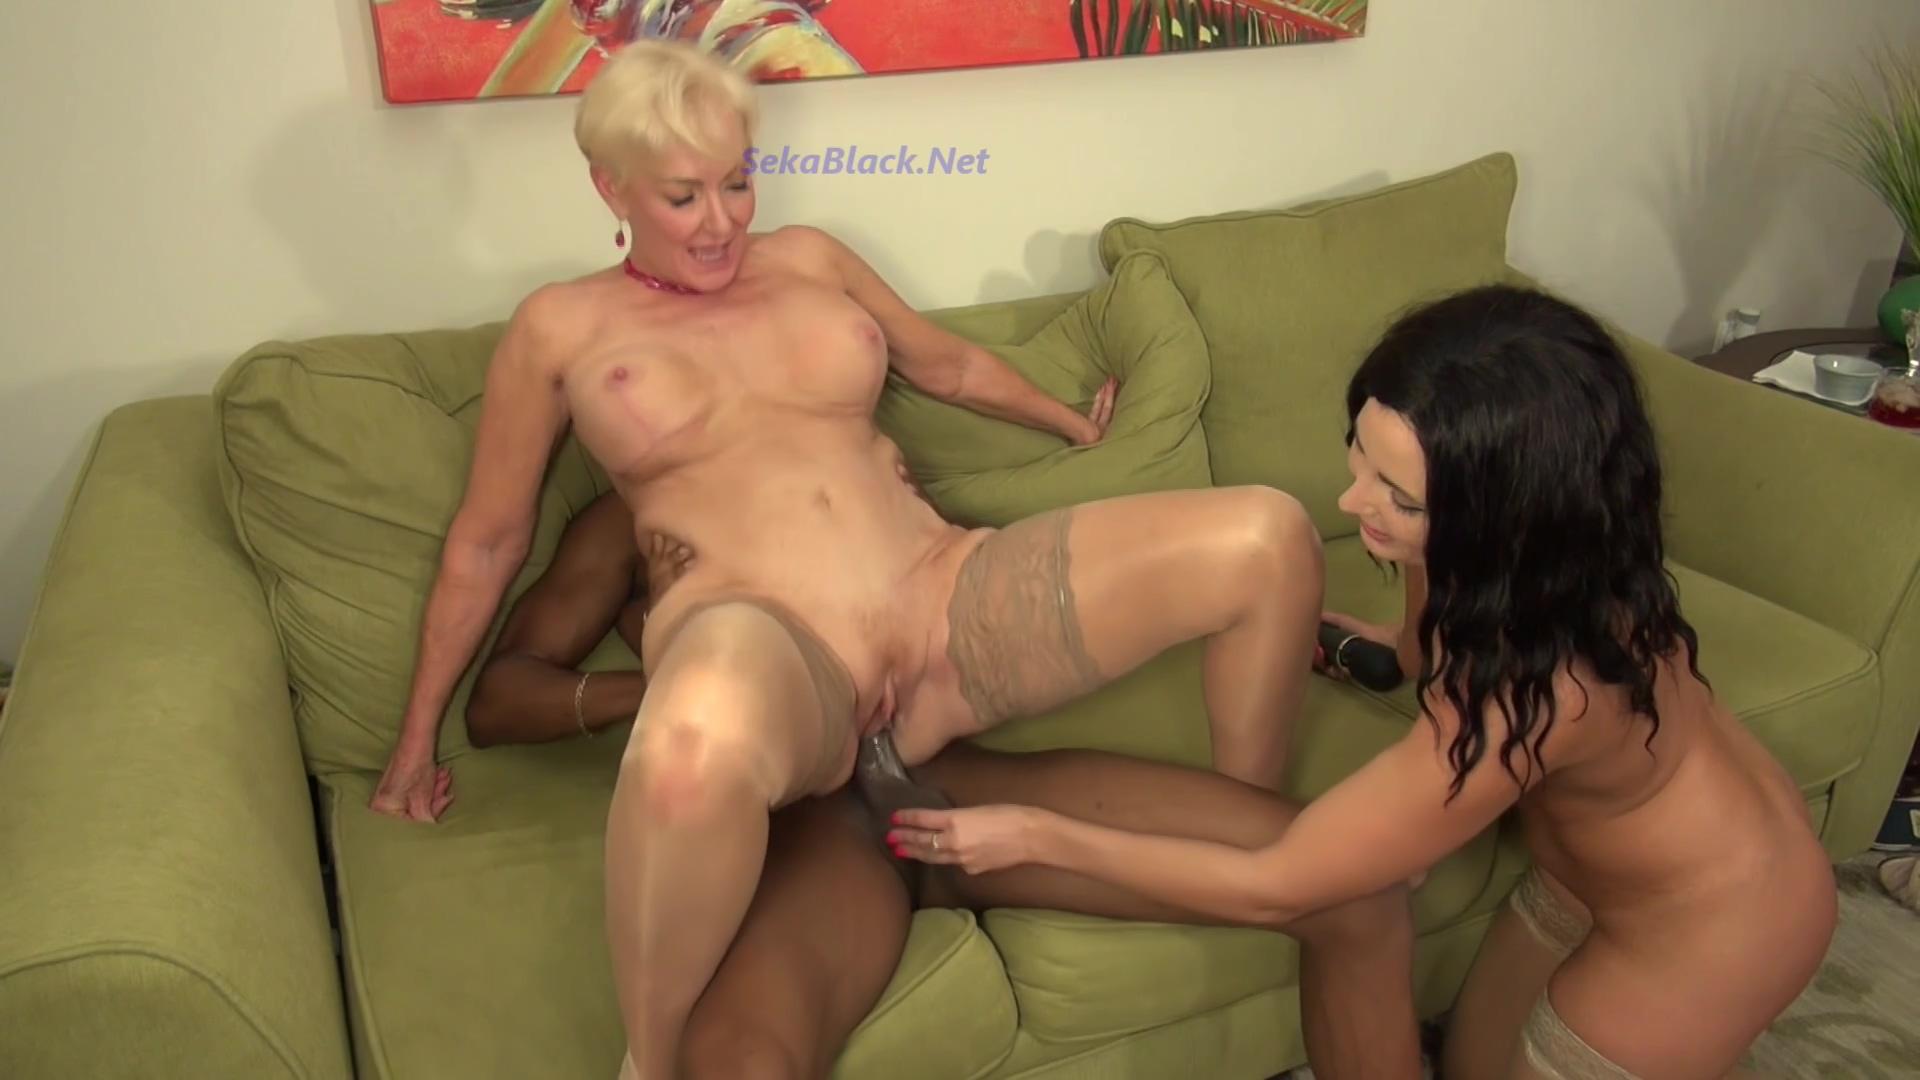 Video 1493996704: seka, cock interracial threesome, mature interracial threesome, big cock threesome, threesome handjob, blonde mature threesome, blonde brunette threesome, blonde threesome hd, tattoo threesome, stockings threesome, 3some